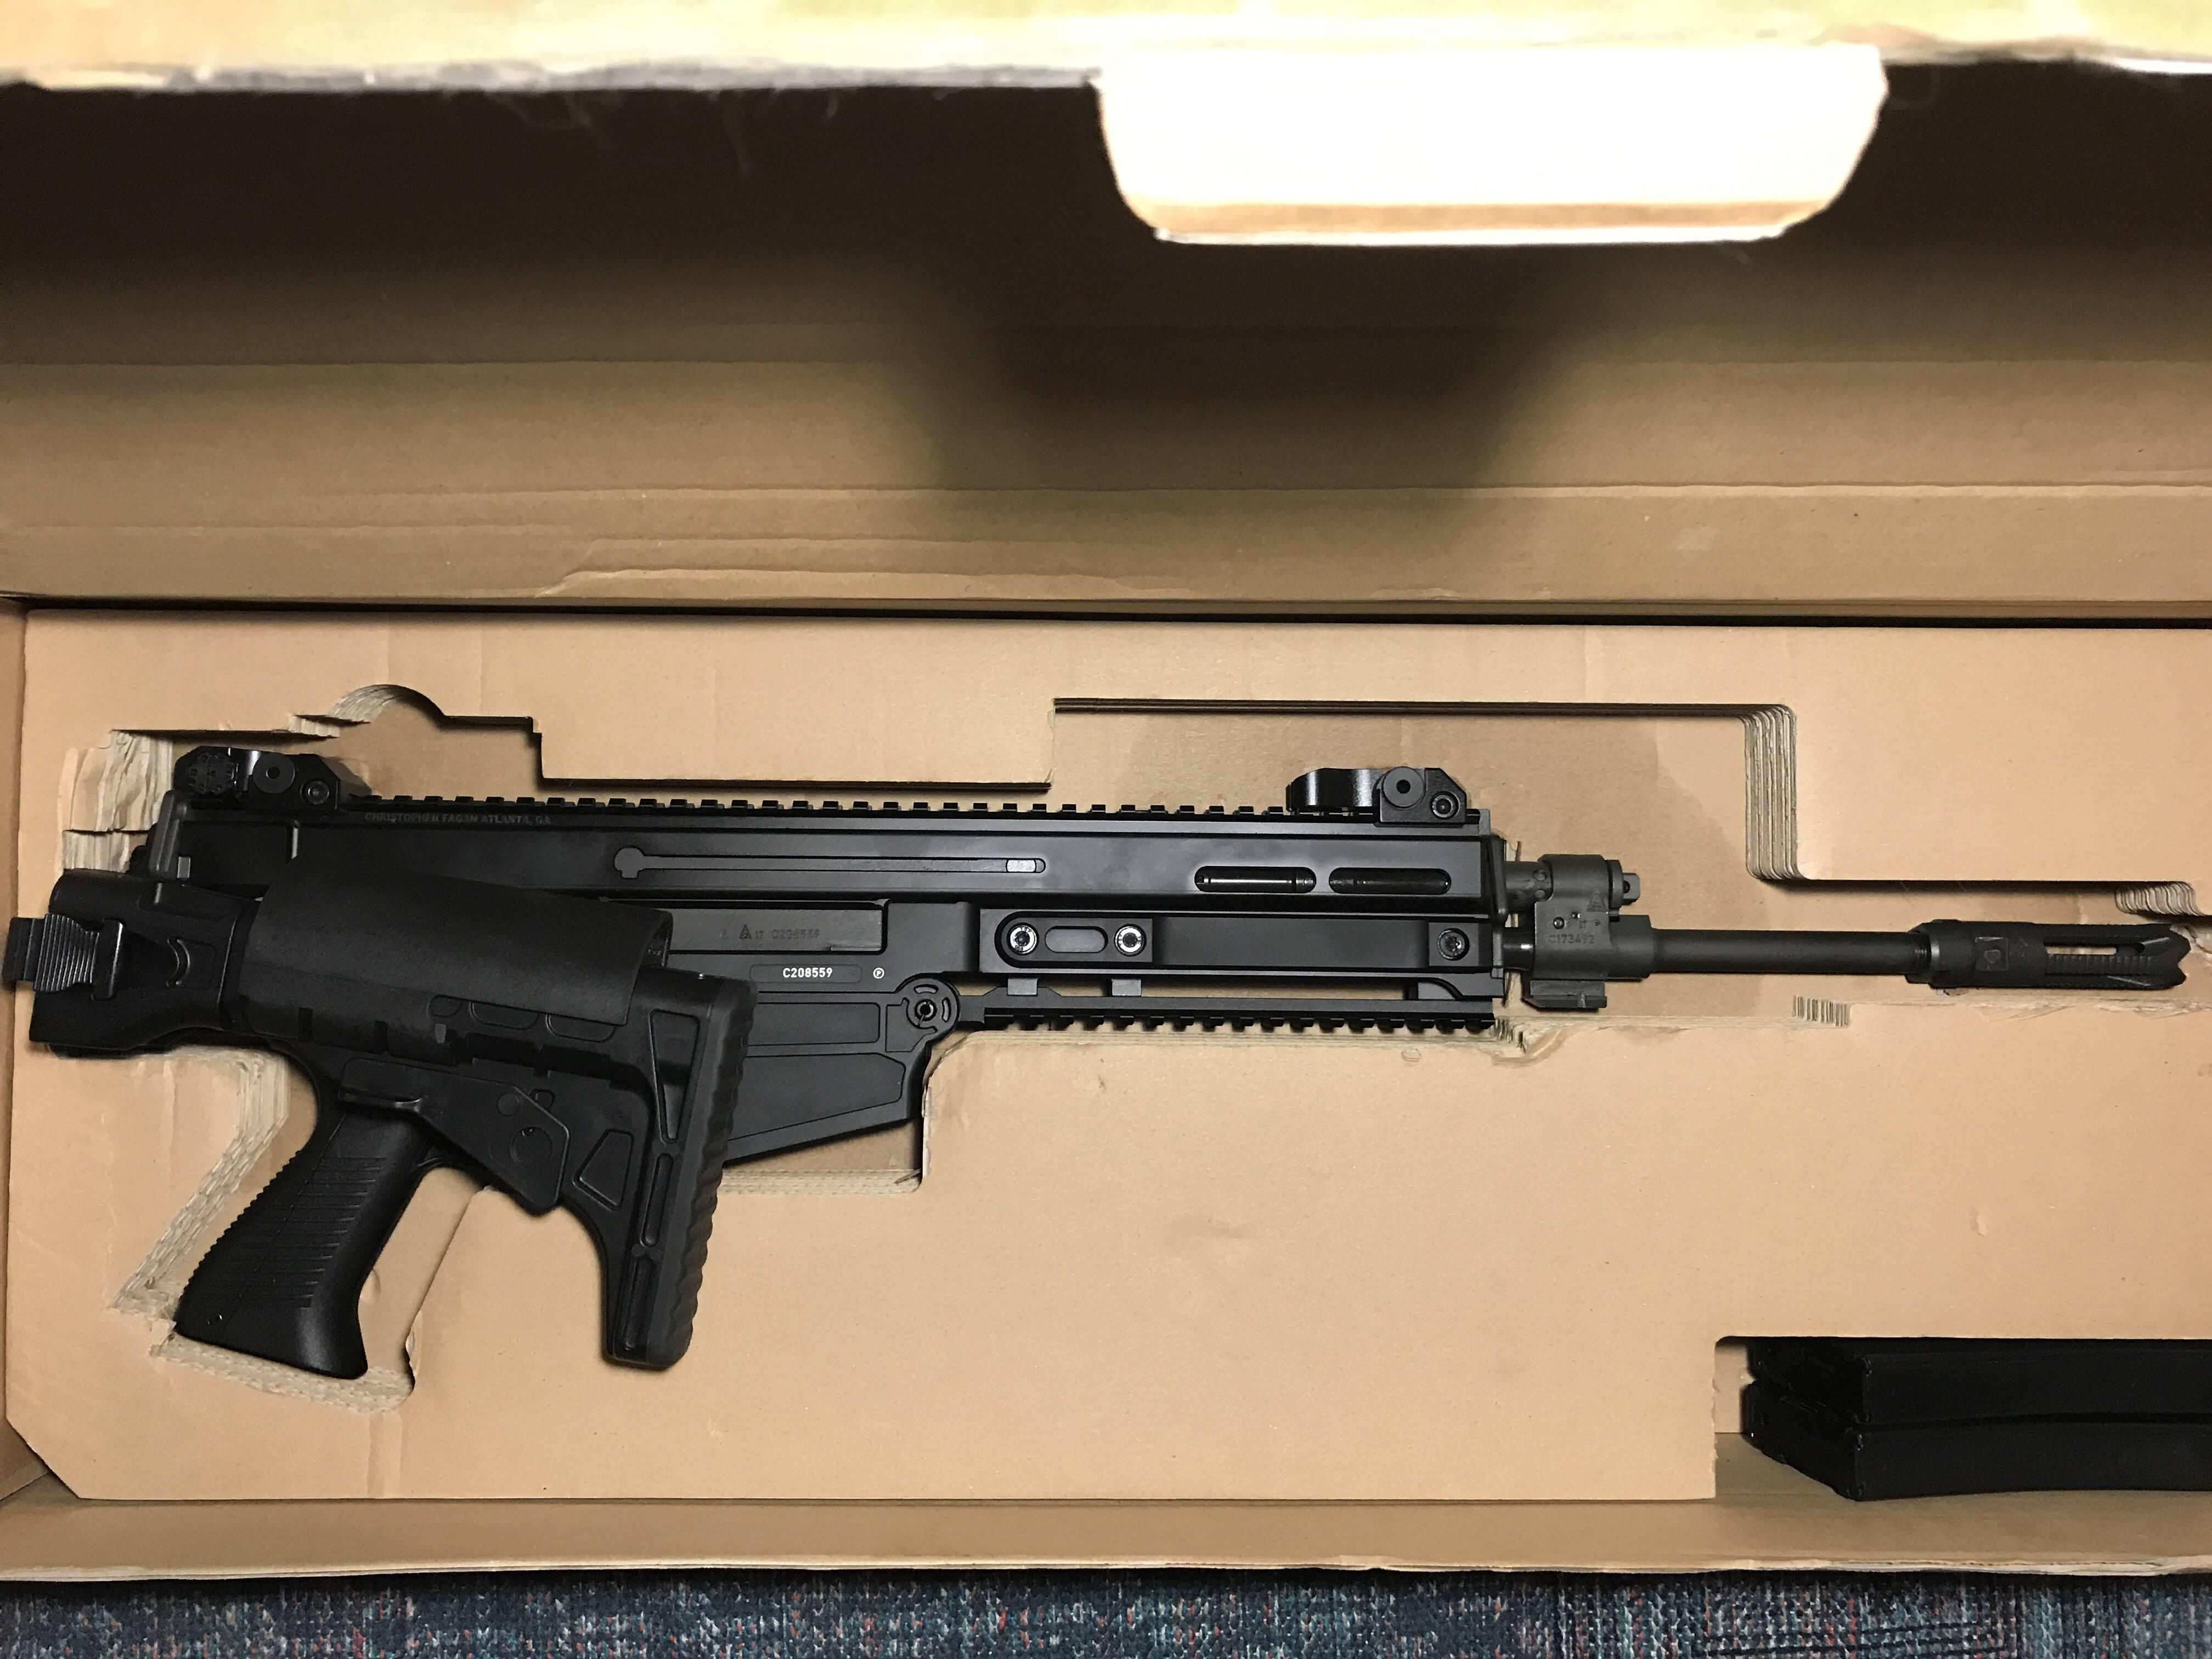 WTT CZ Bren 805 S1 Carbine